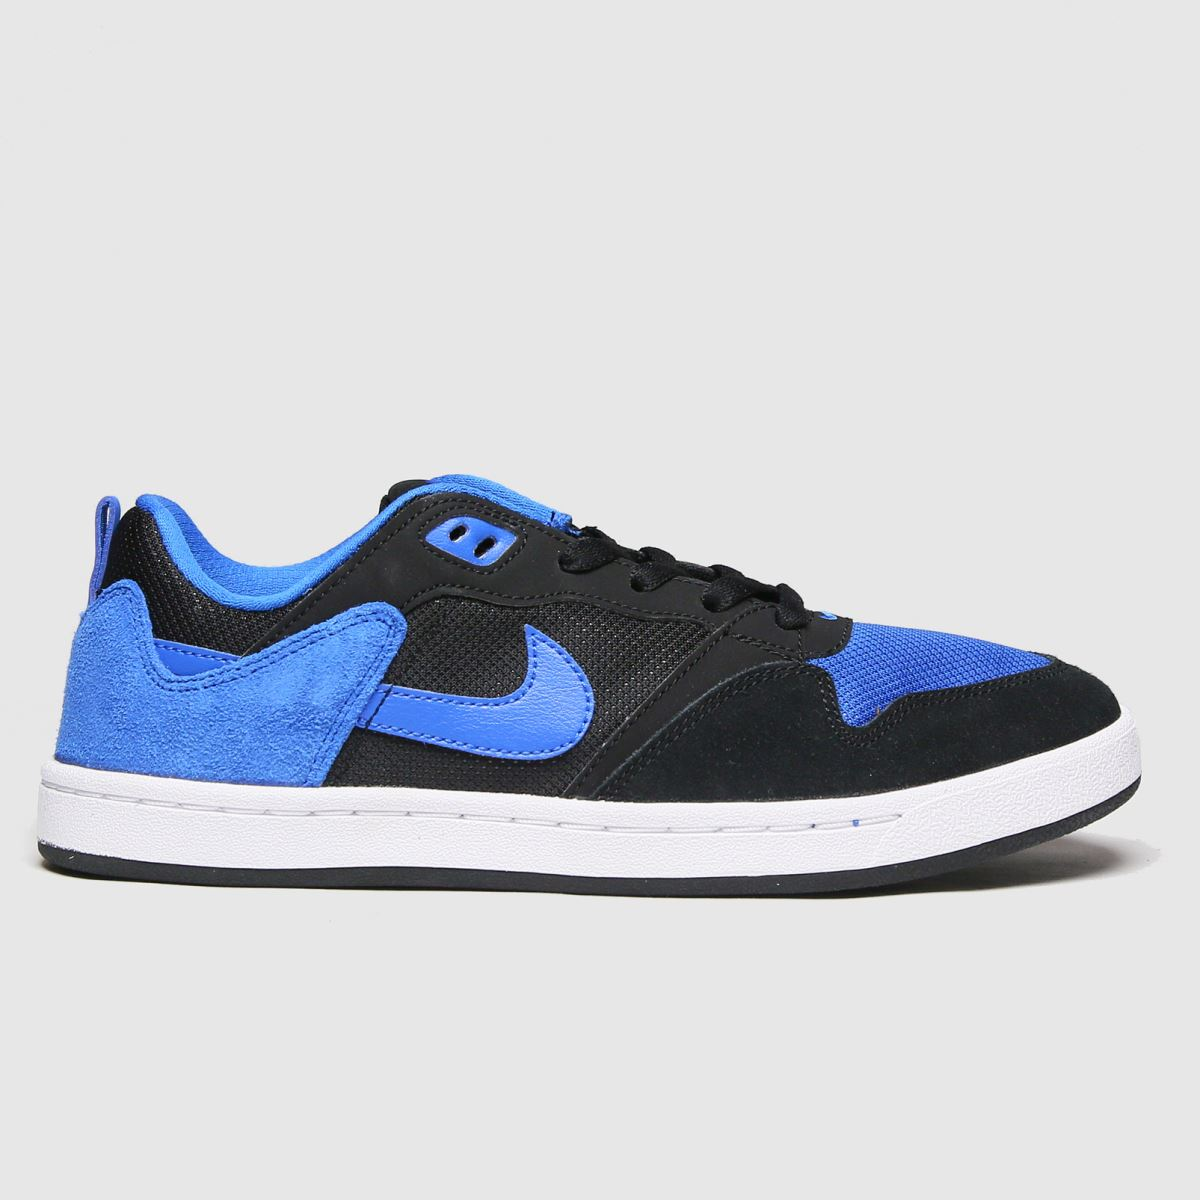 Nike SB Nike SB Black And Blue Sb Alleyoop Trainers